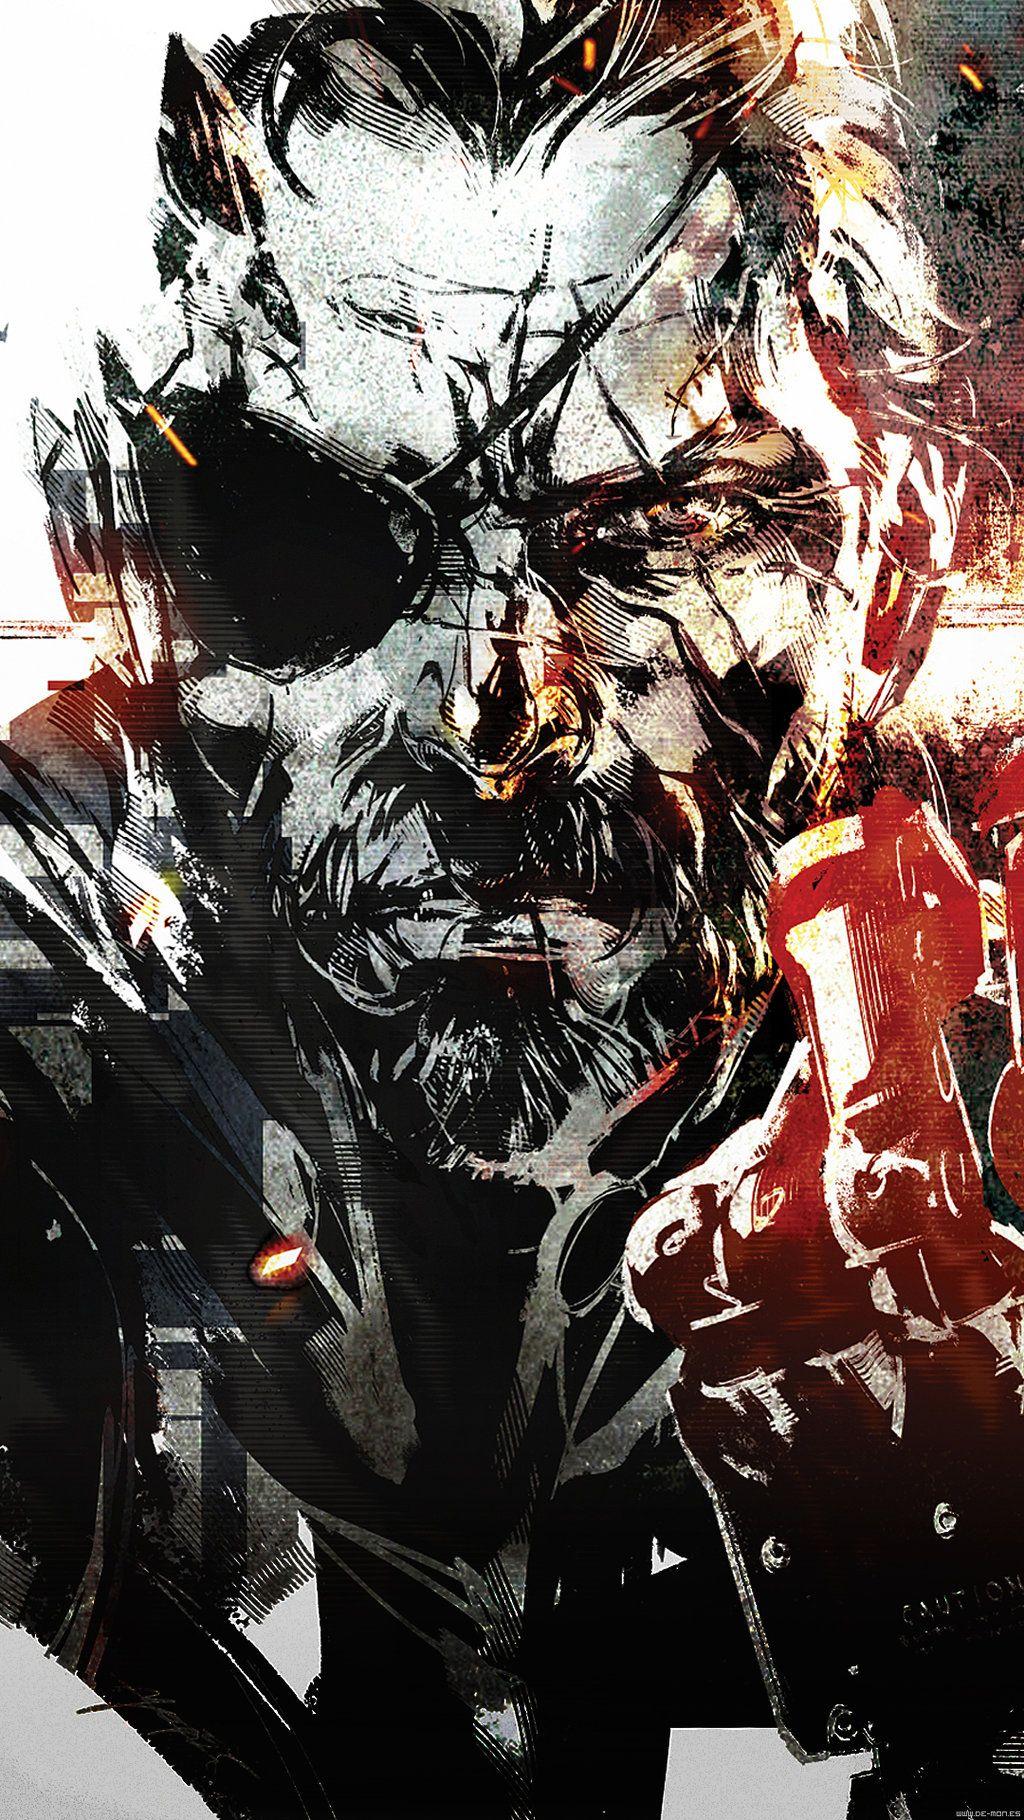 Metal Gear Solid Wallpaper Metal Gear Solid V The Phantom Pain